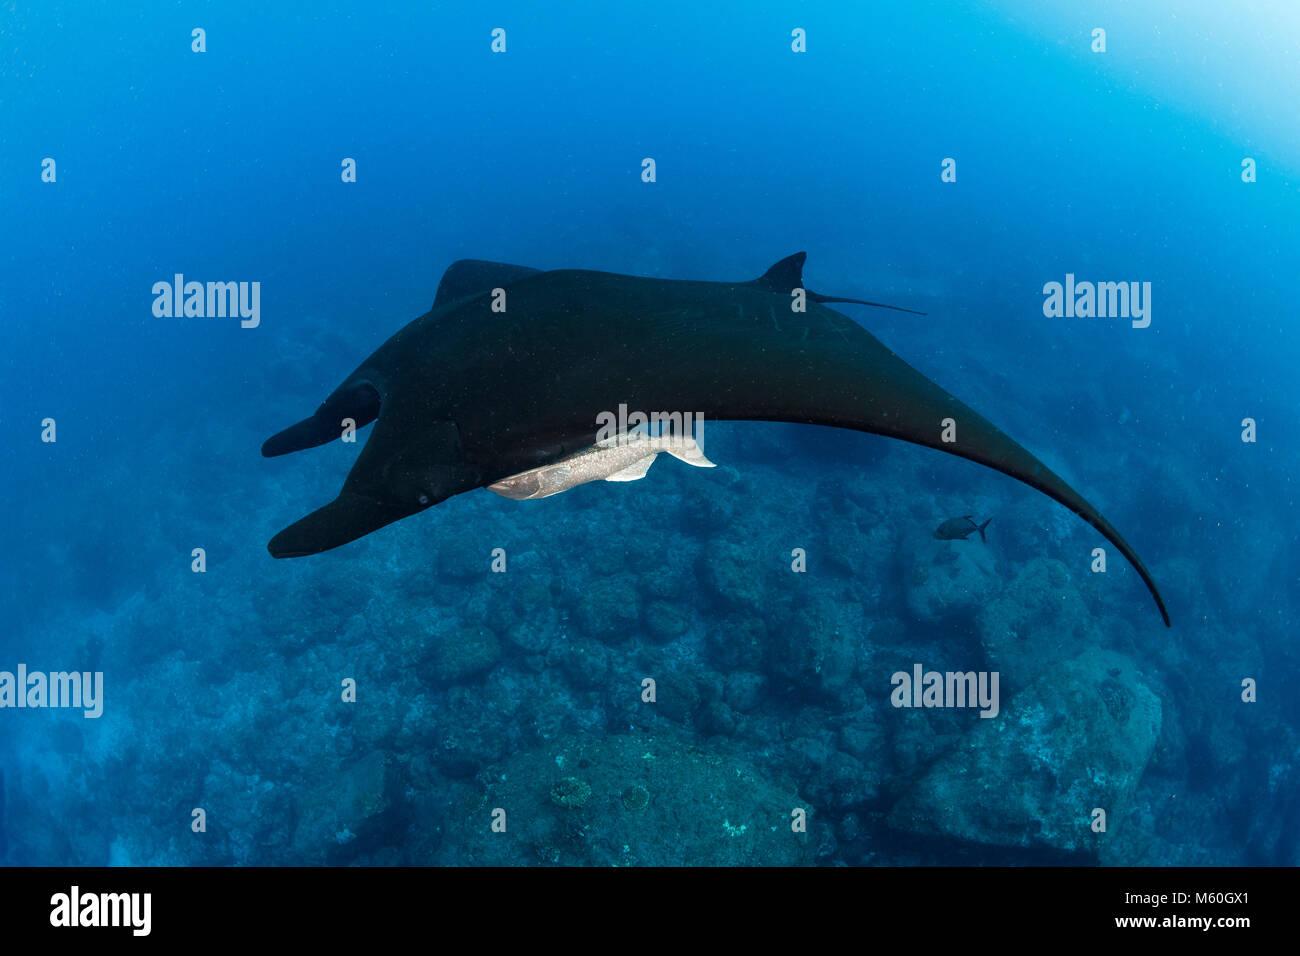 Giant Manta Ray, Manta birostris, San Benedicto Island, Revillagigedo Islands, Mexico Stock Photo